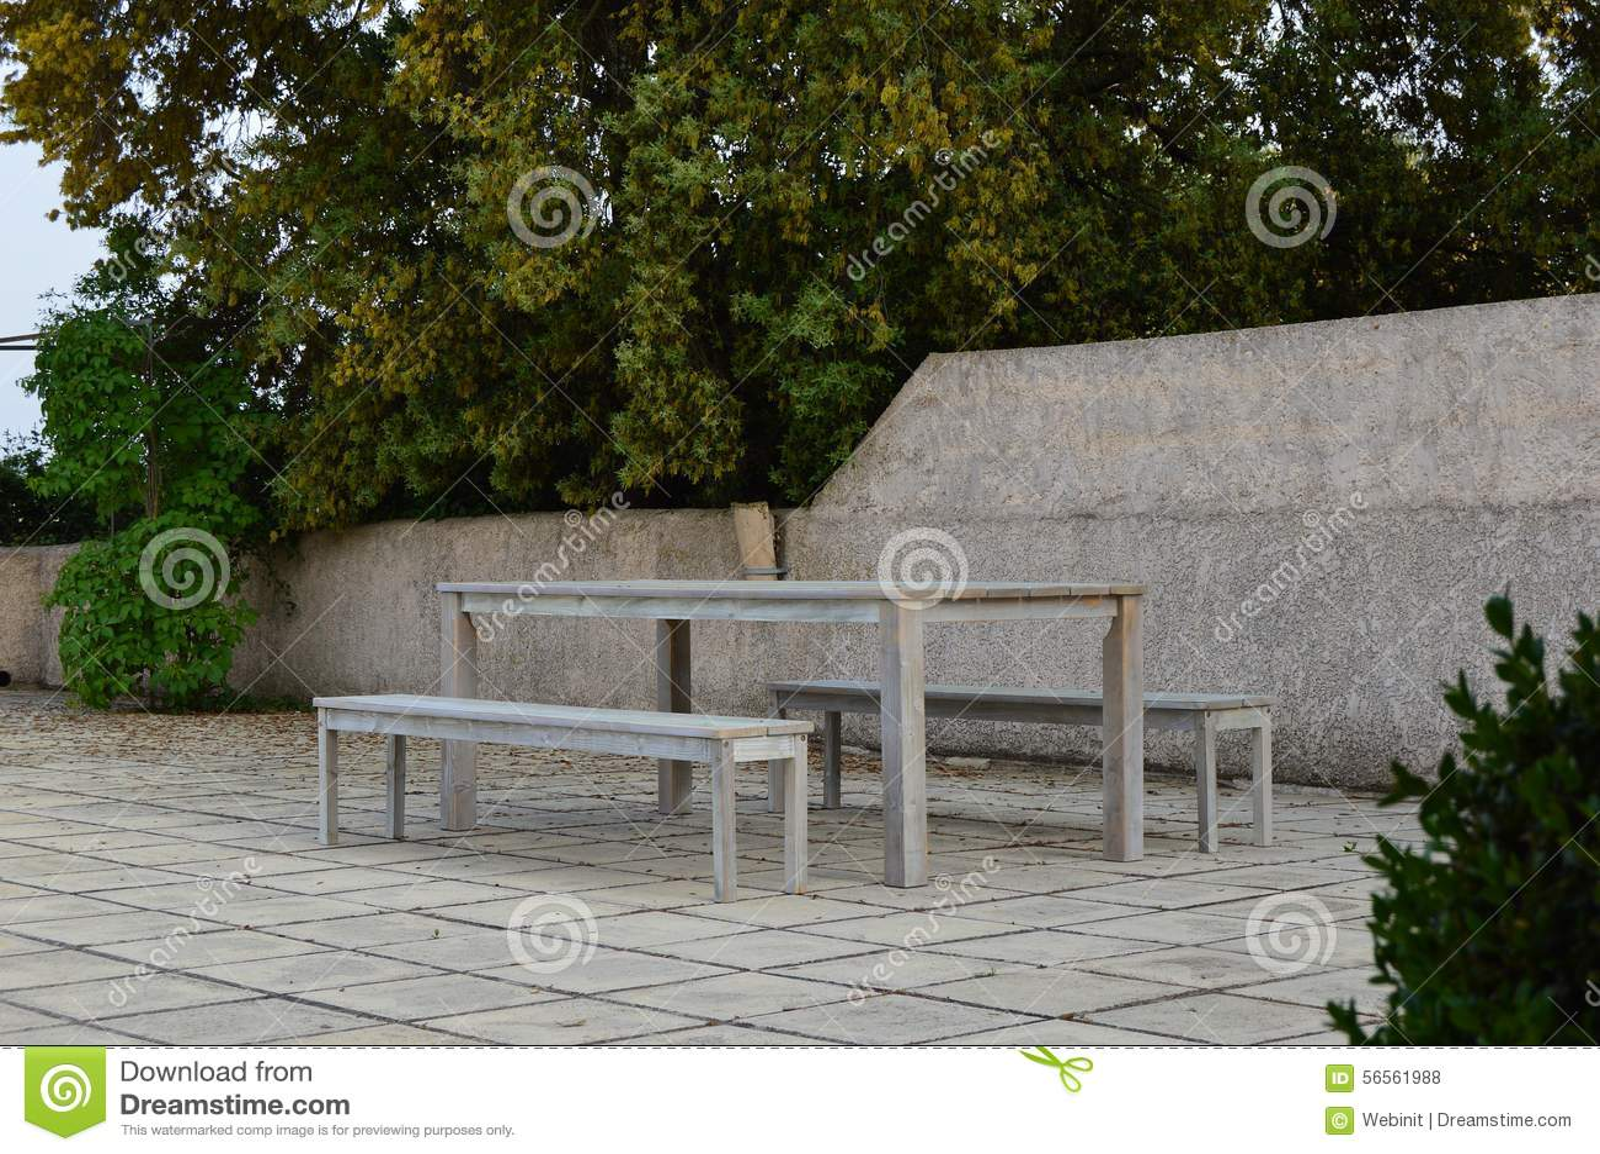 Download πίνακας ξύλινος στοκ εικόνες. εικόνα από απεικόνιση, σχέδιο - 56561988